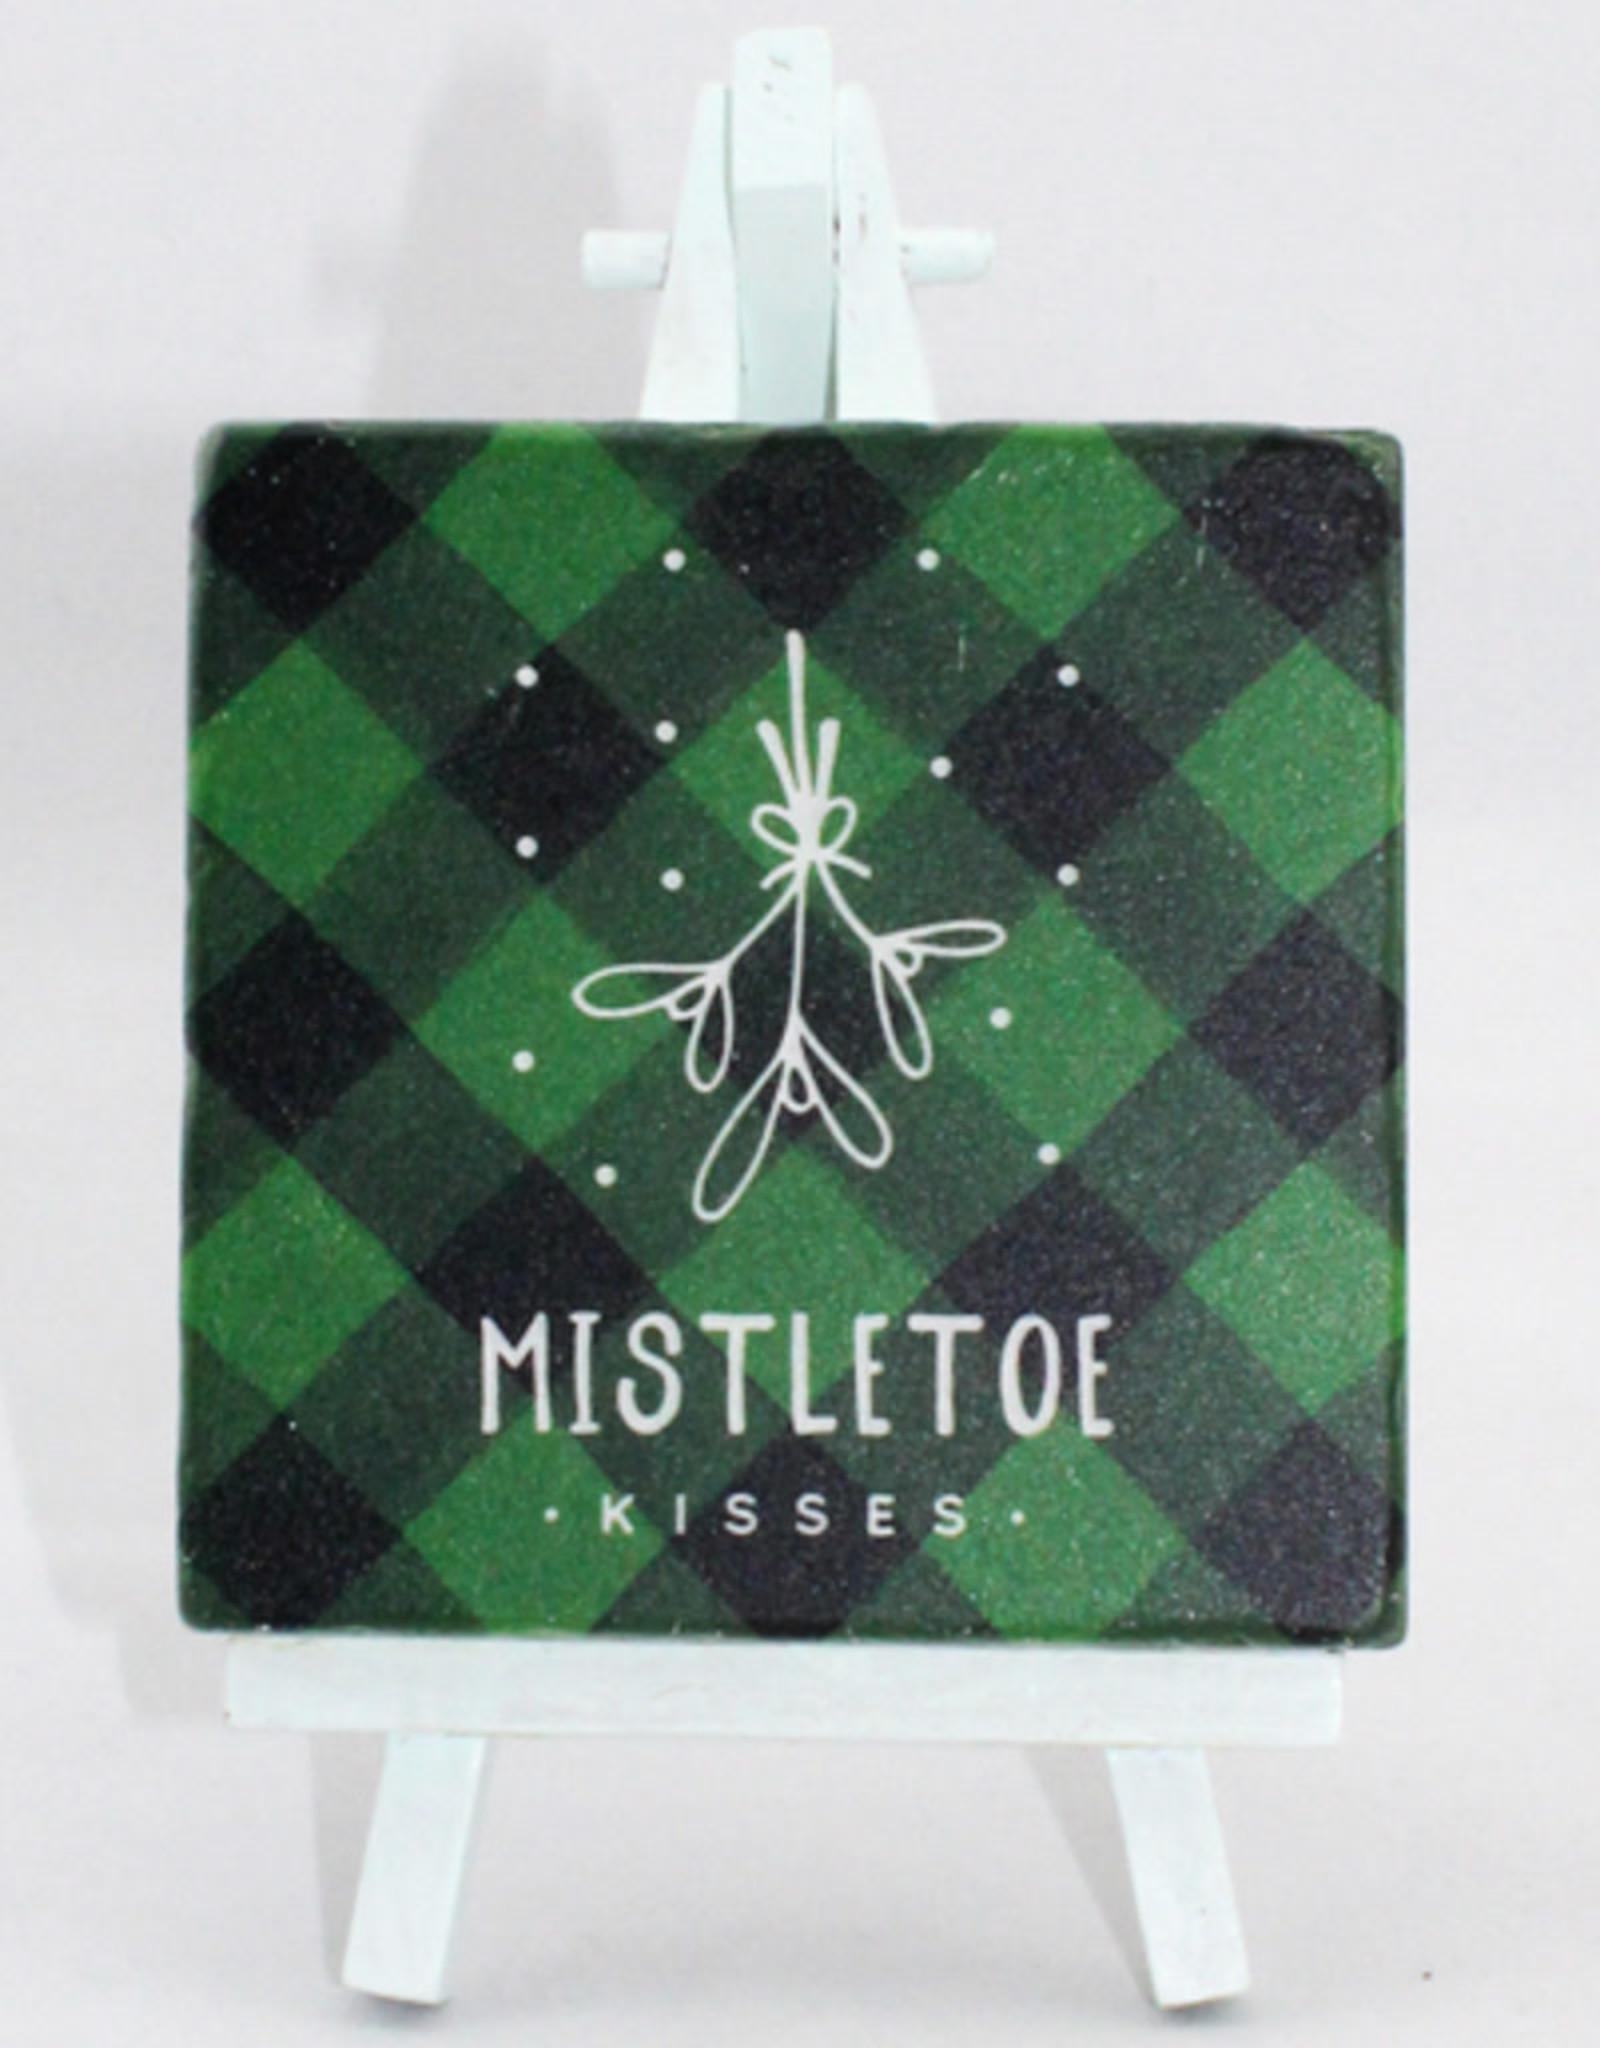 Paisley & Parsley Mistletoe Kisses Green Coaster